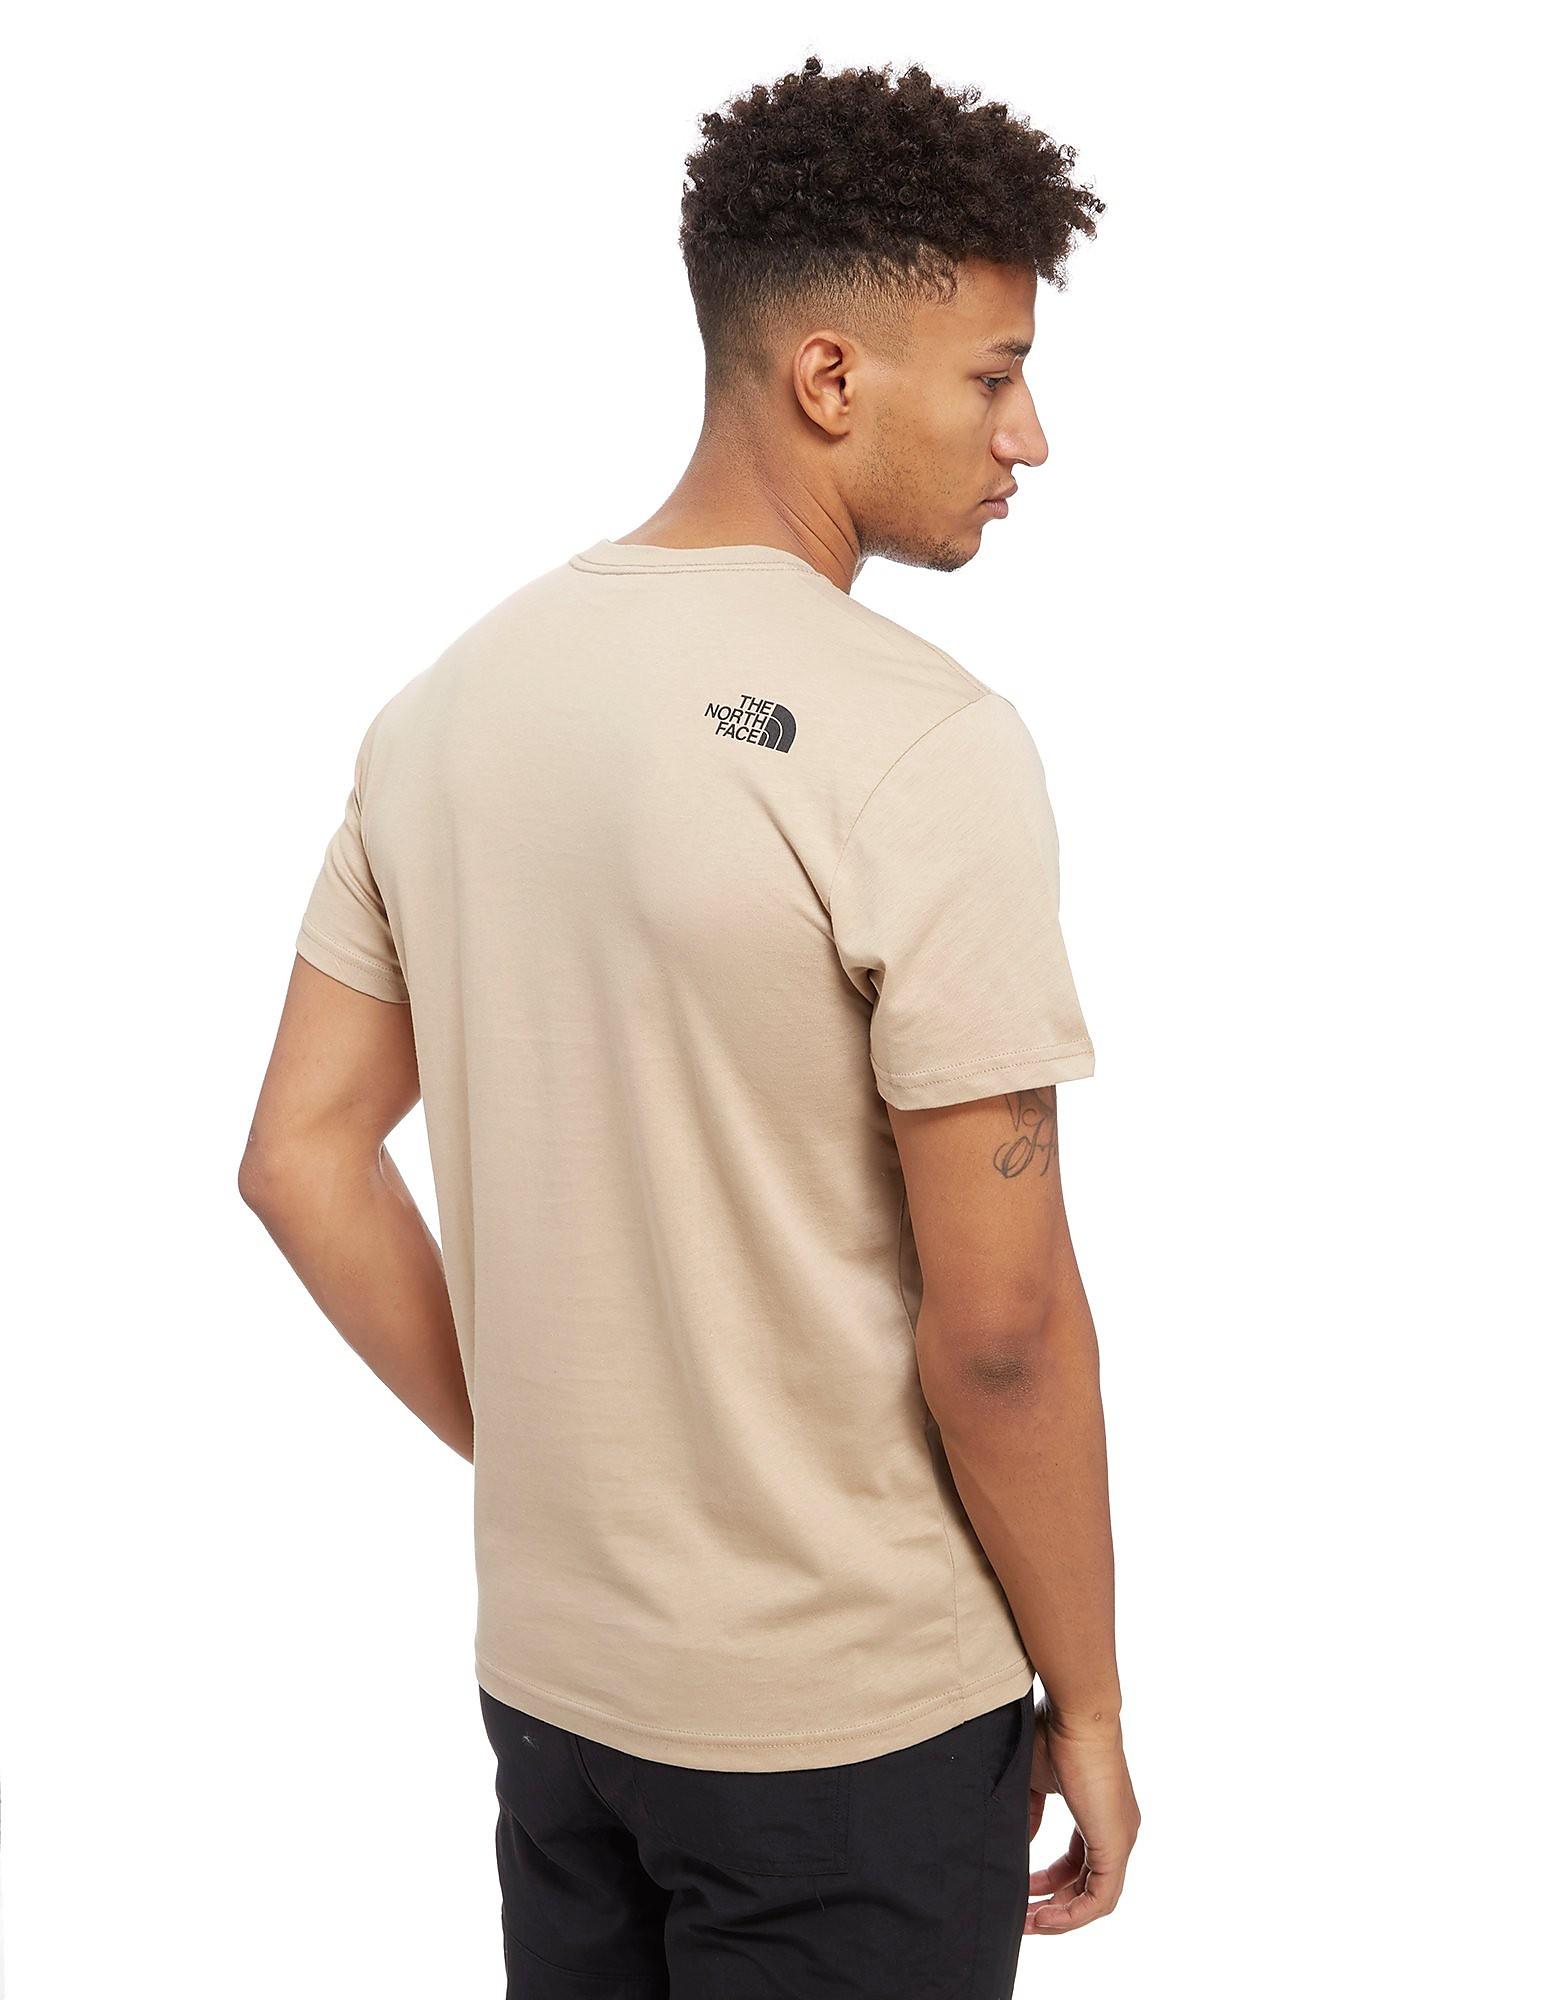 The North Face NSE T-shirt